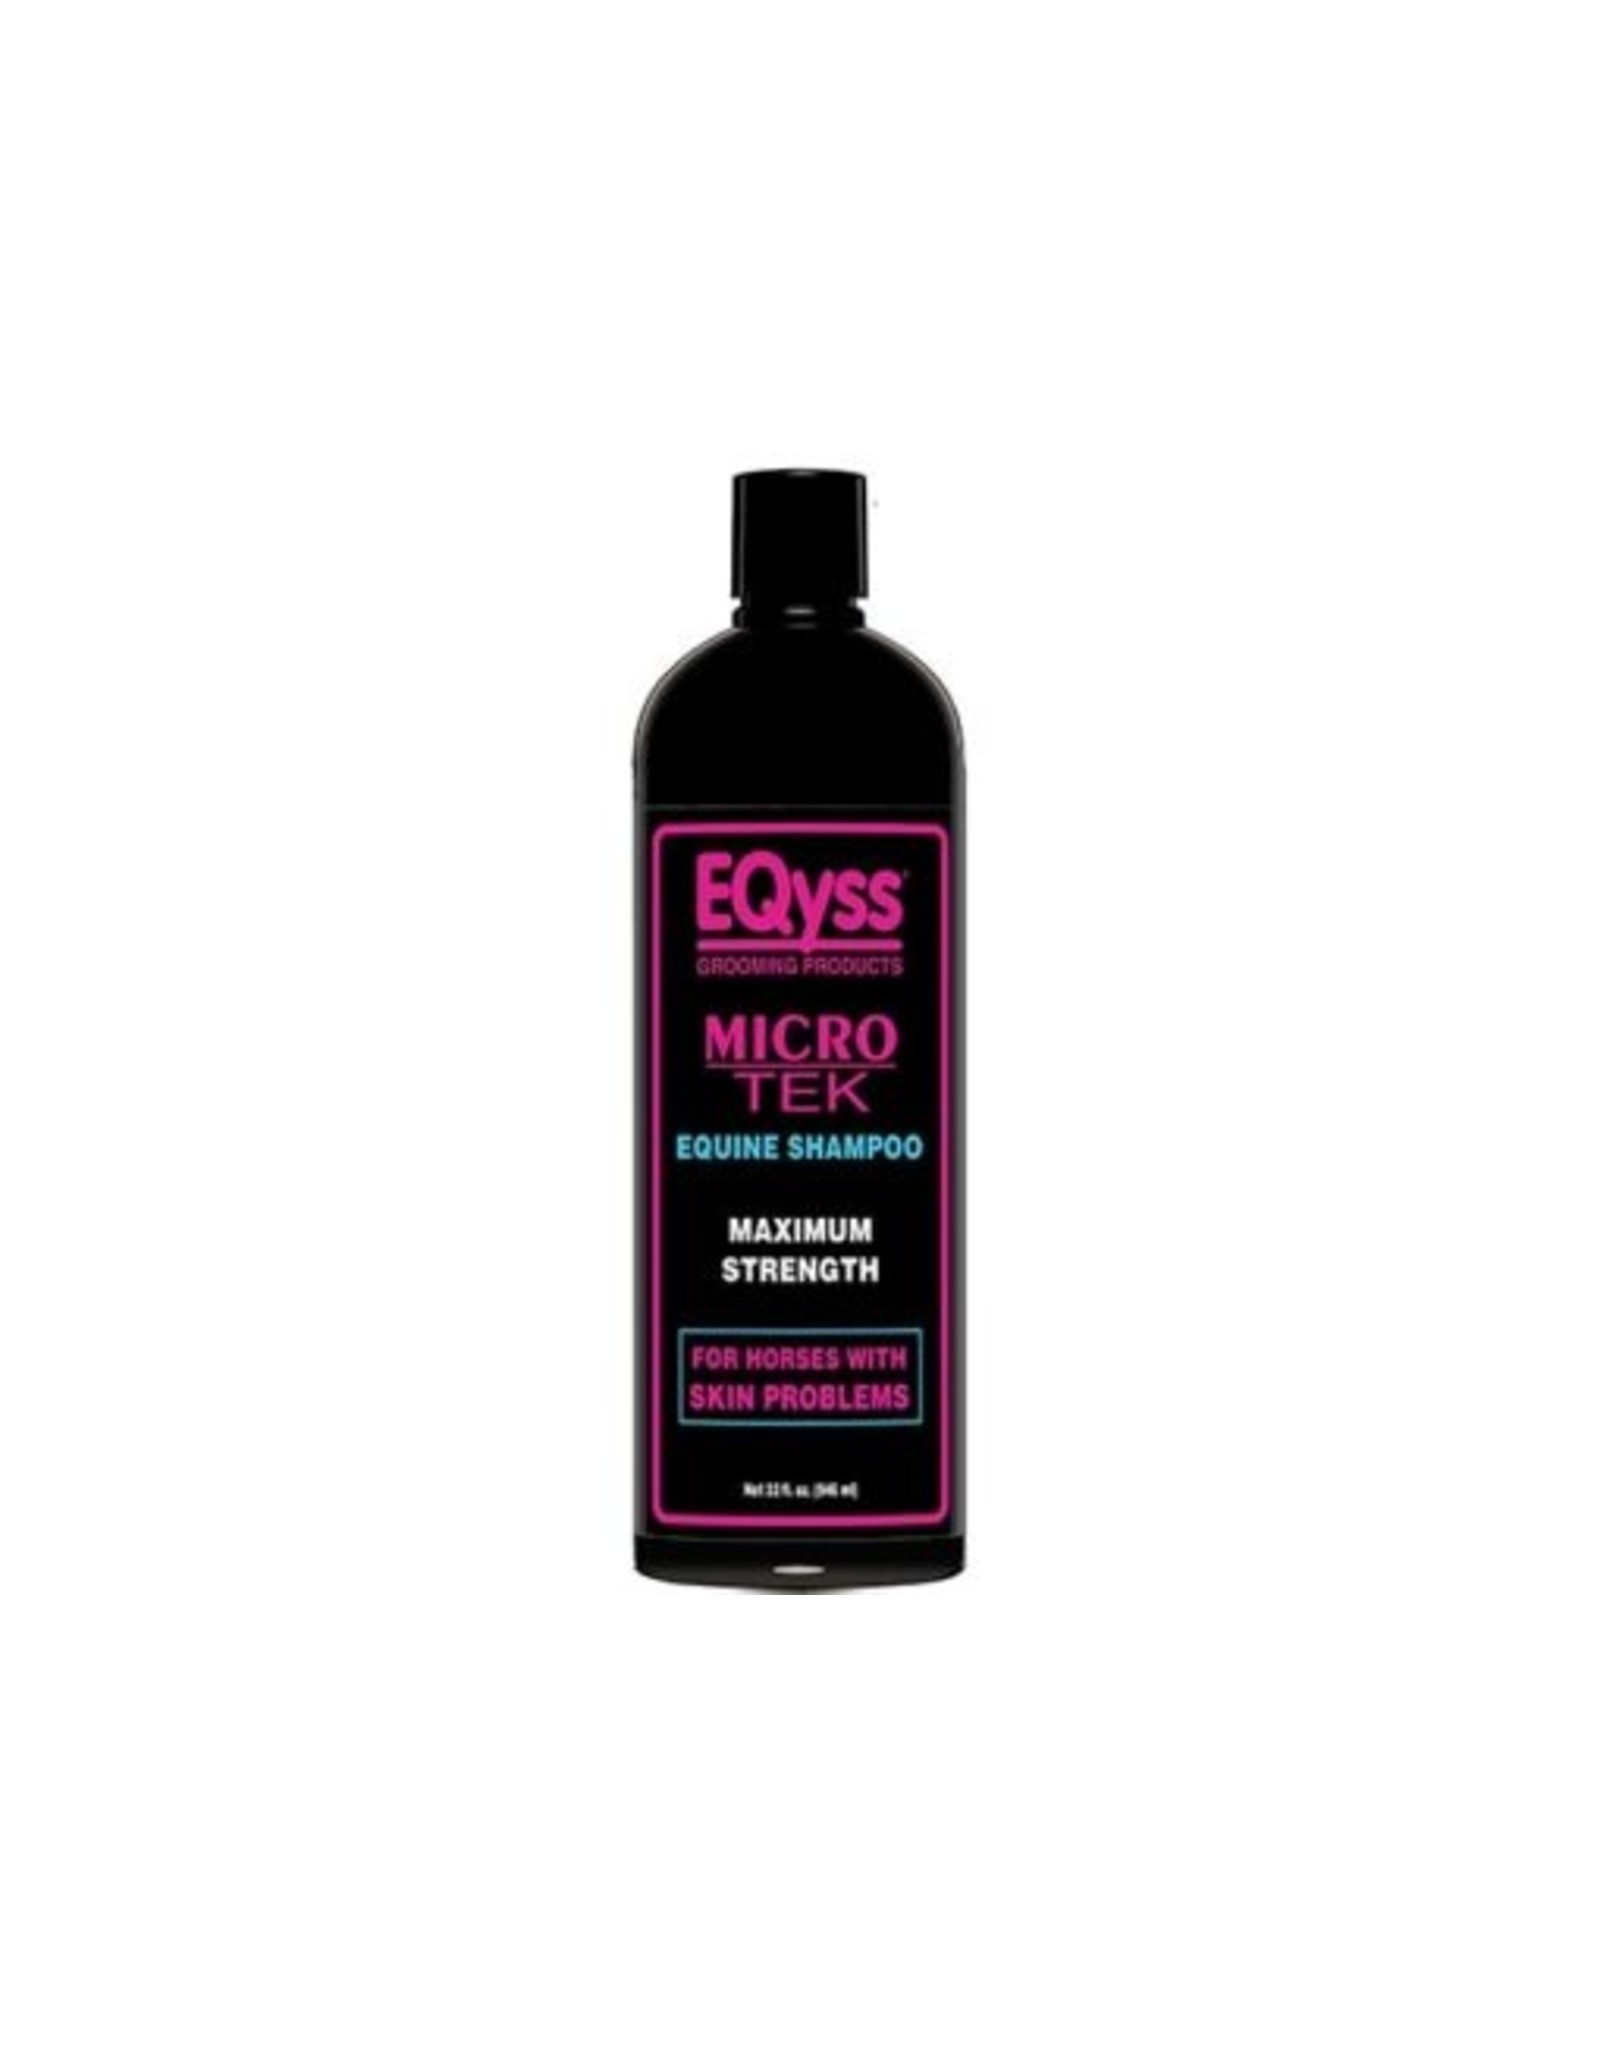 Eqyss Micro-Tek Equine Shampoo